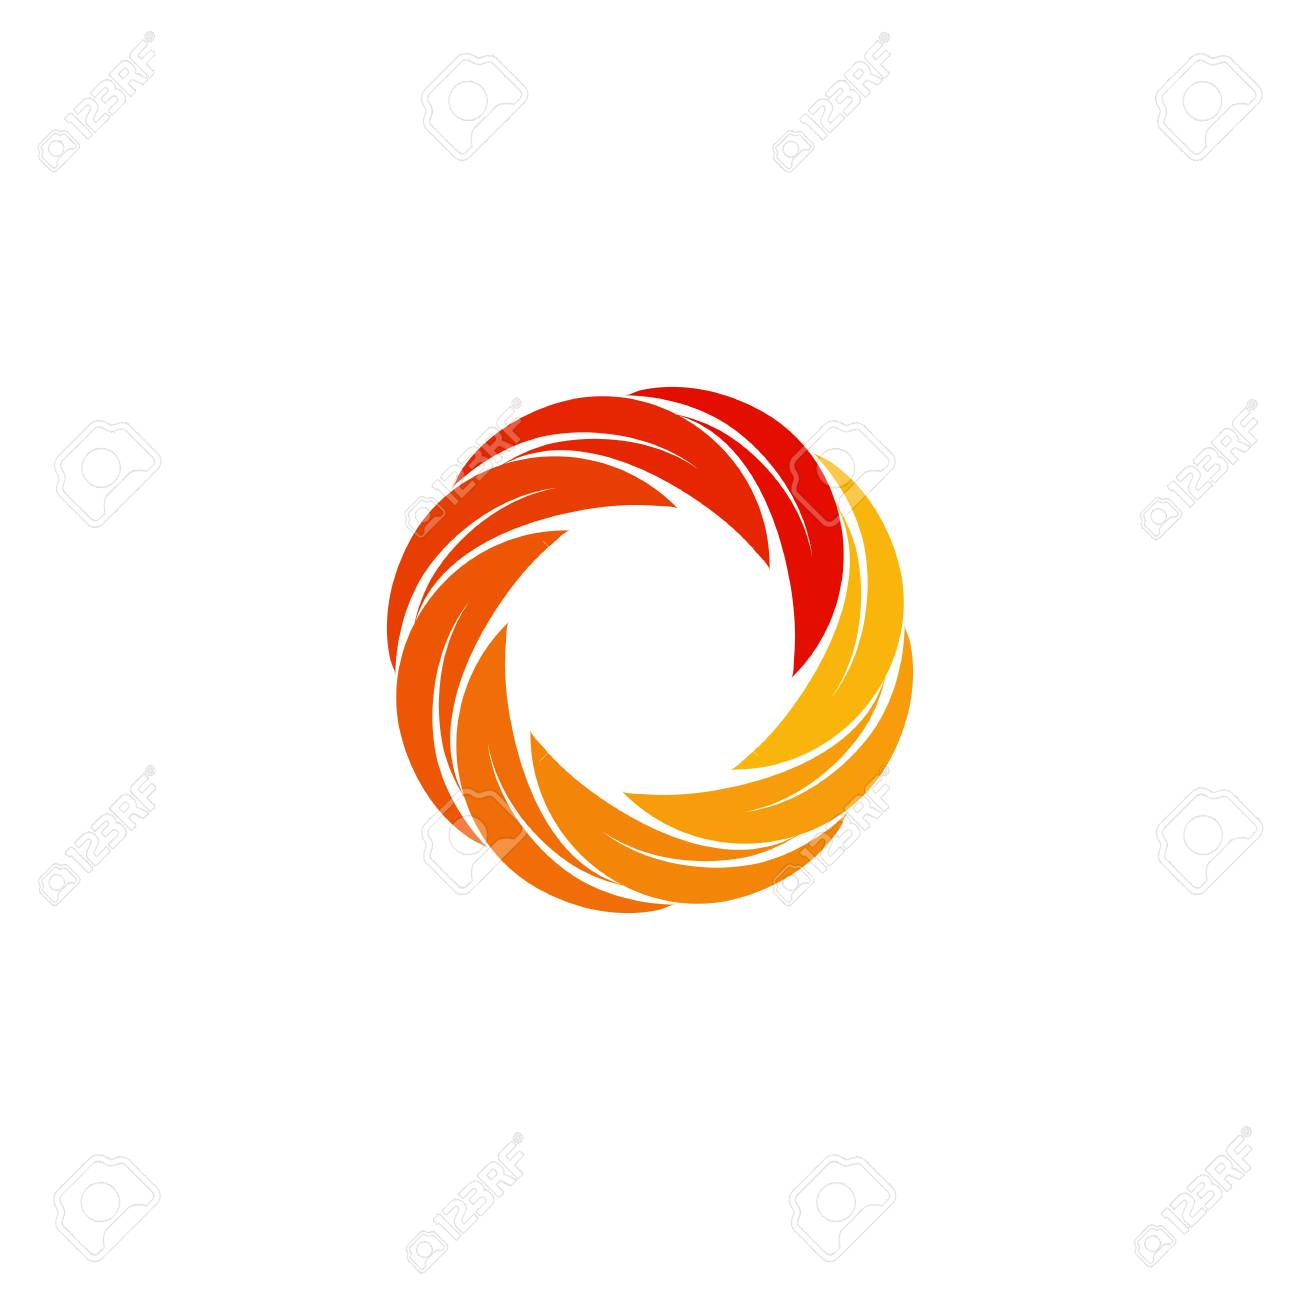 isolated abstract red orange yellow circular sun logo round